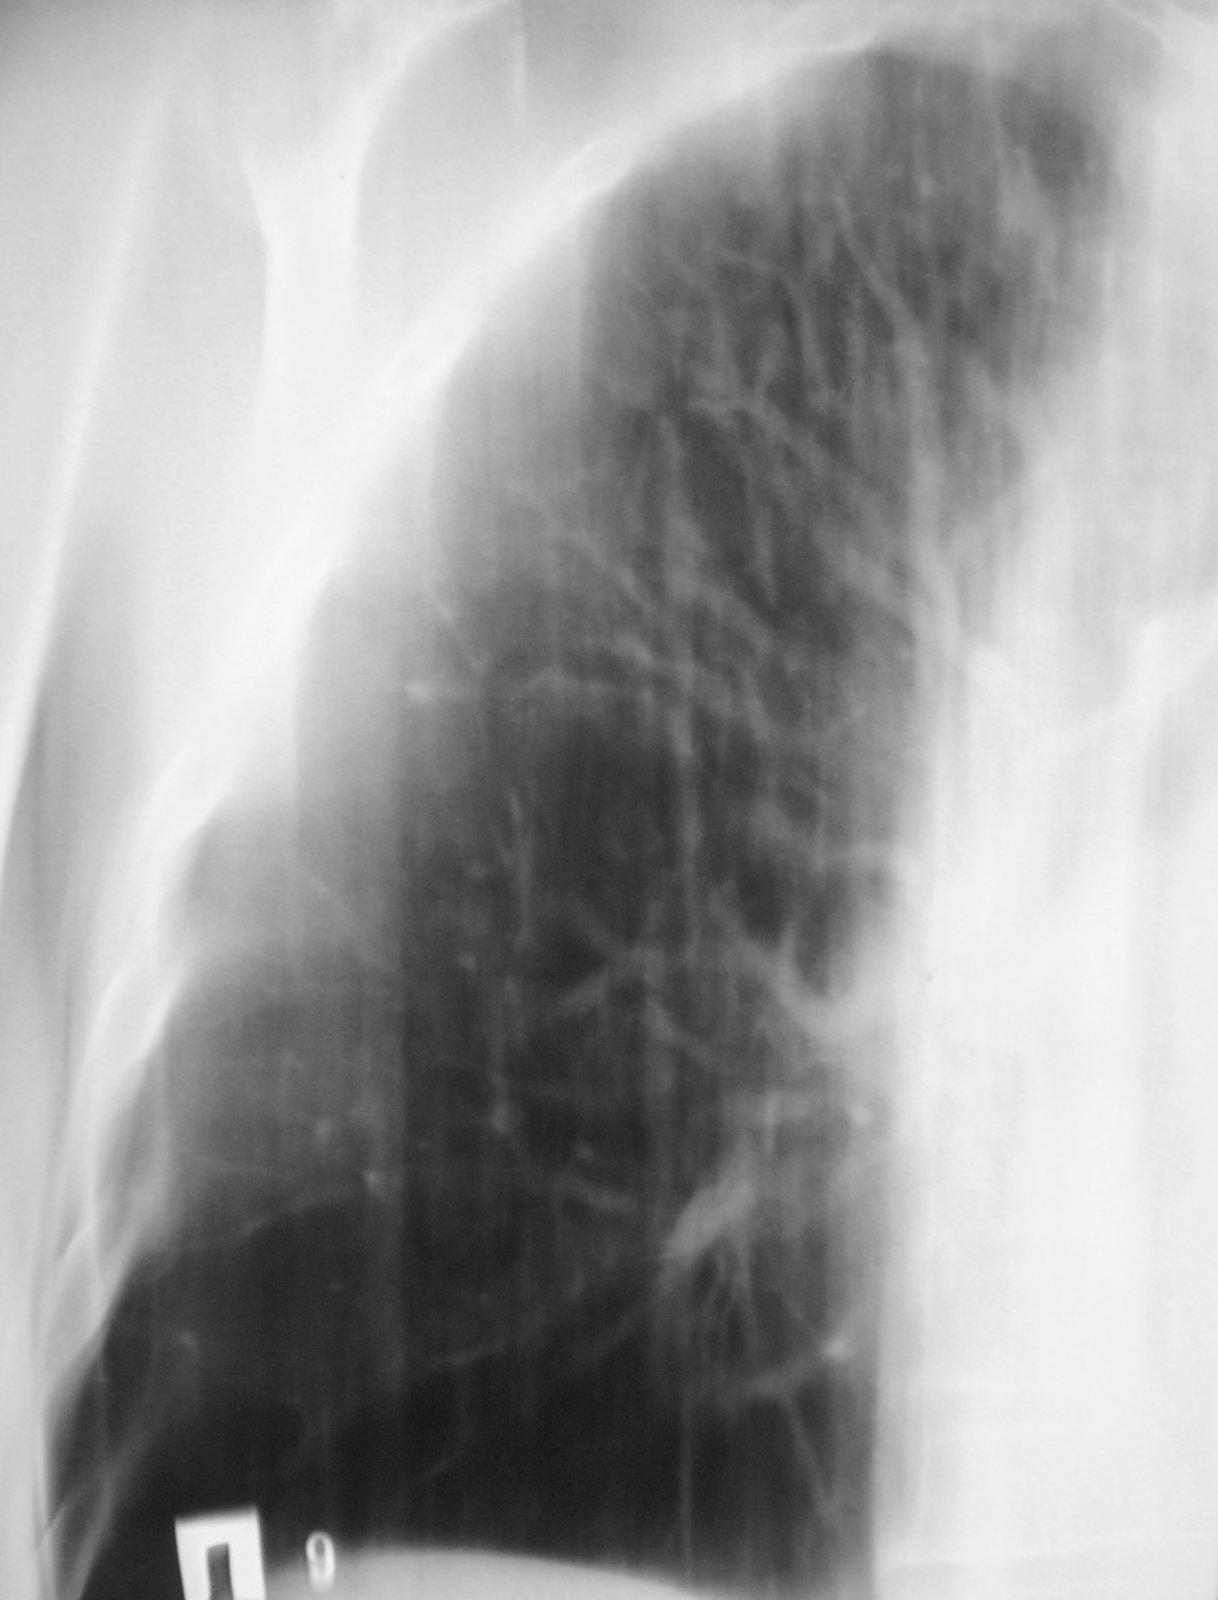 Пневморентгенография